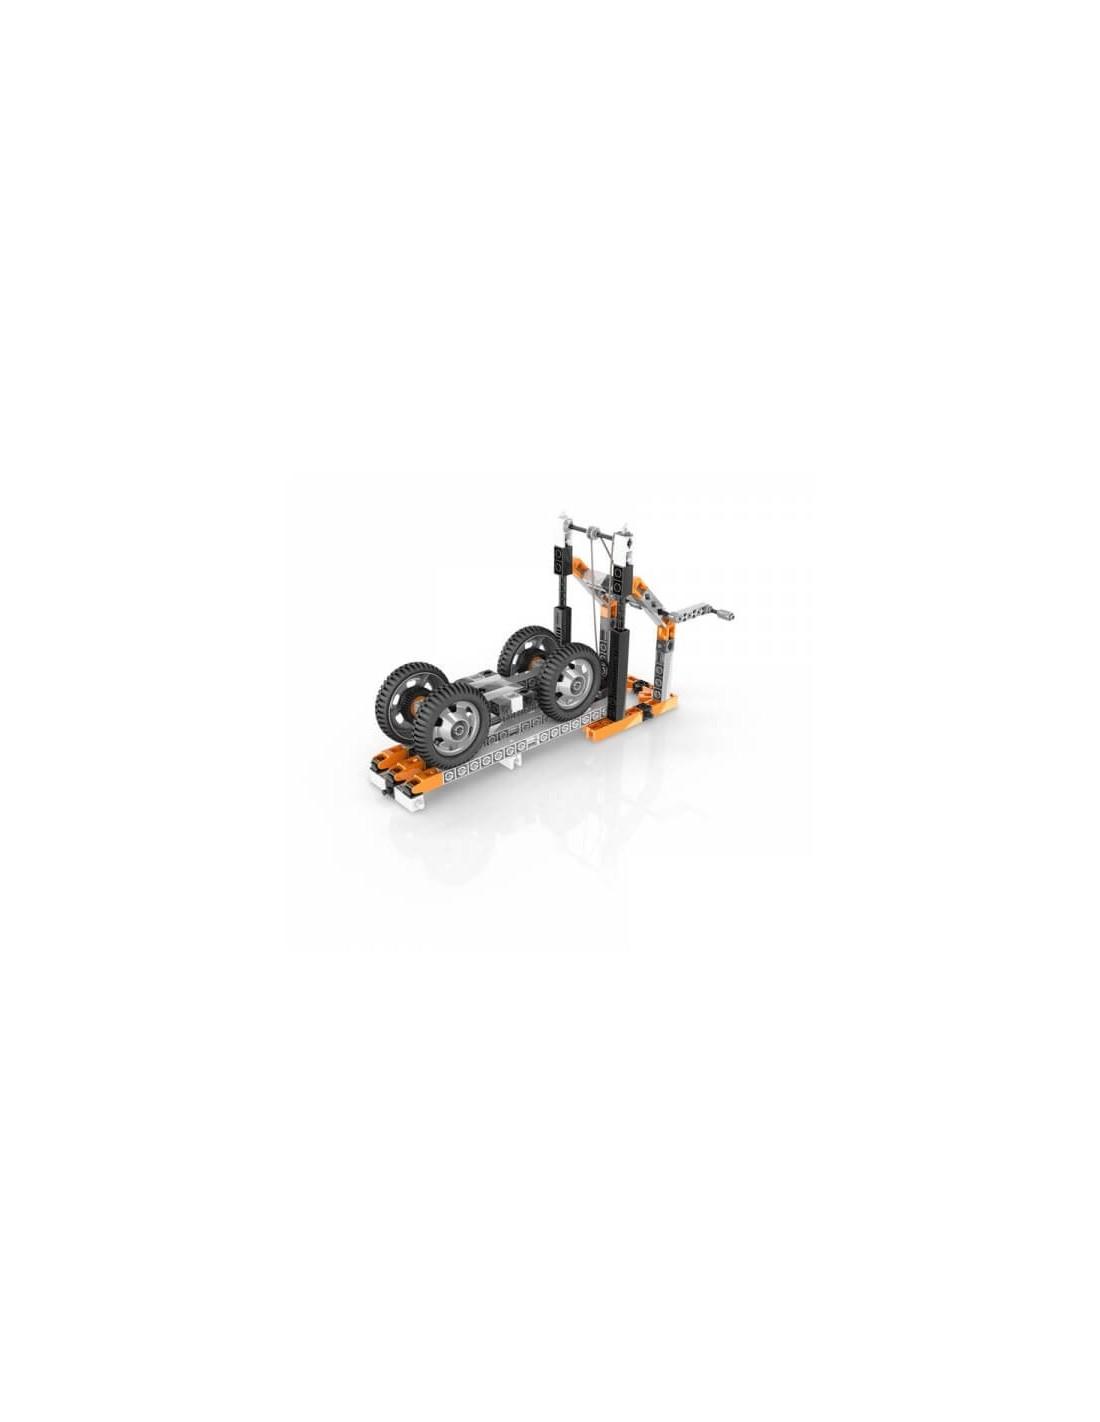 Set de constructie - STEM Wheels, Axles and Inclined Planes | Engino - 6